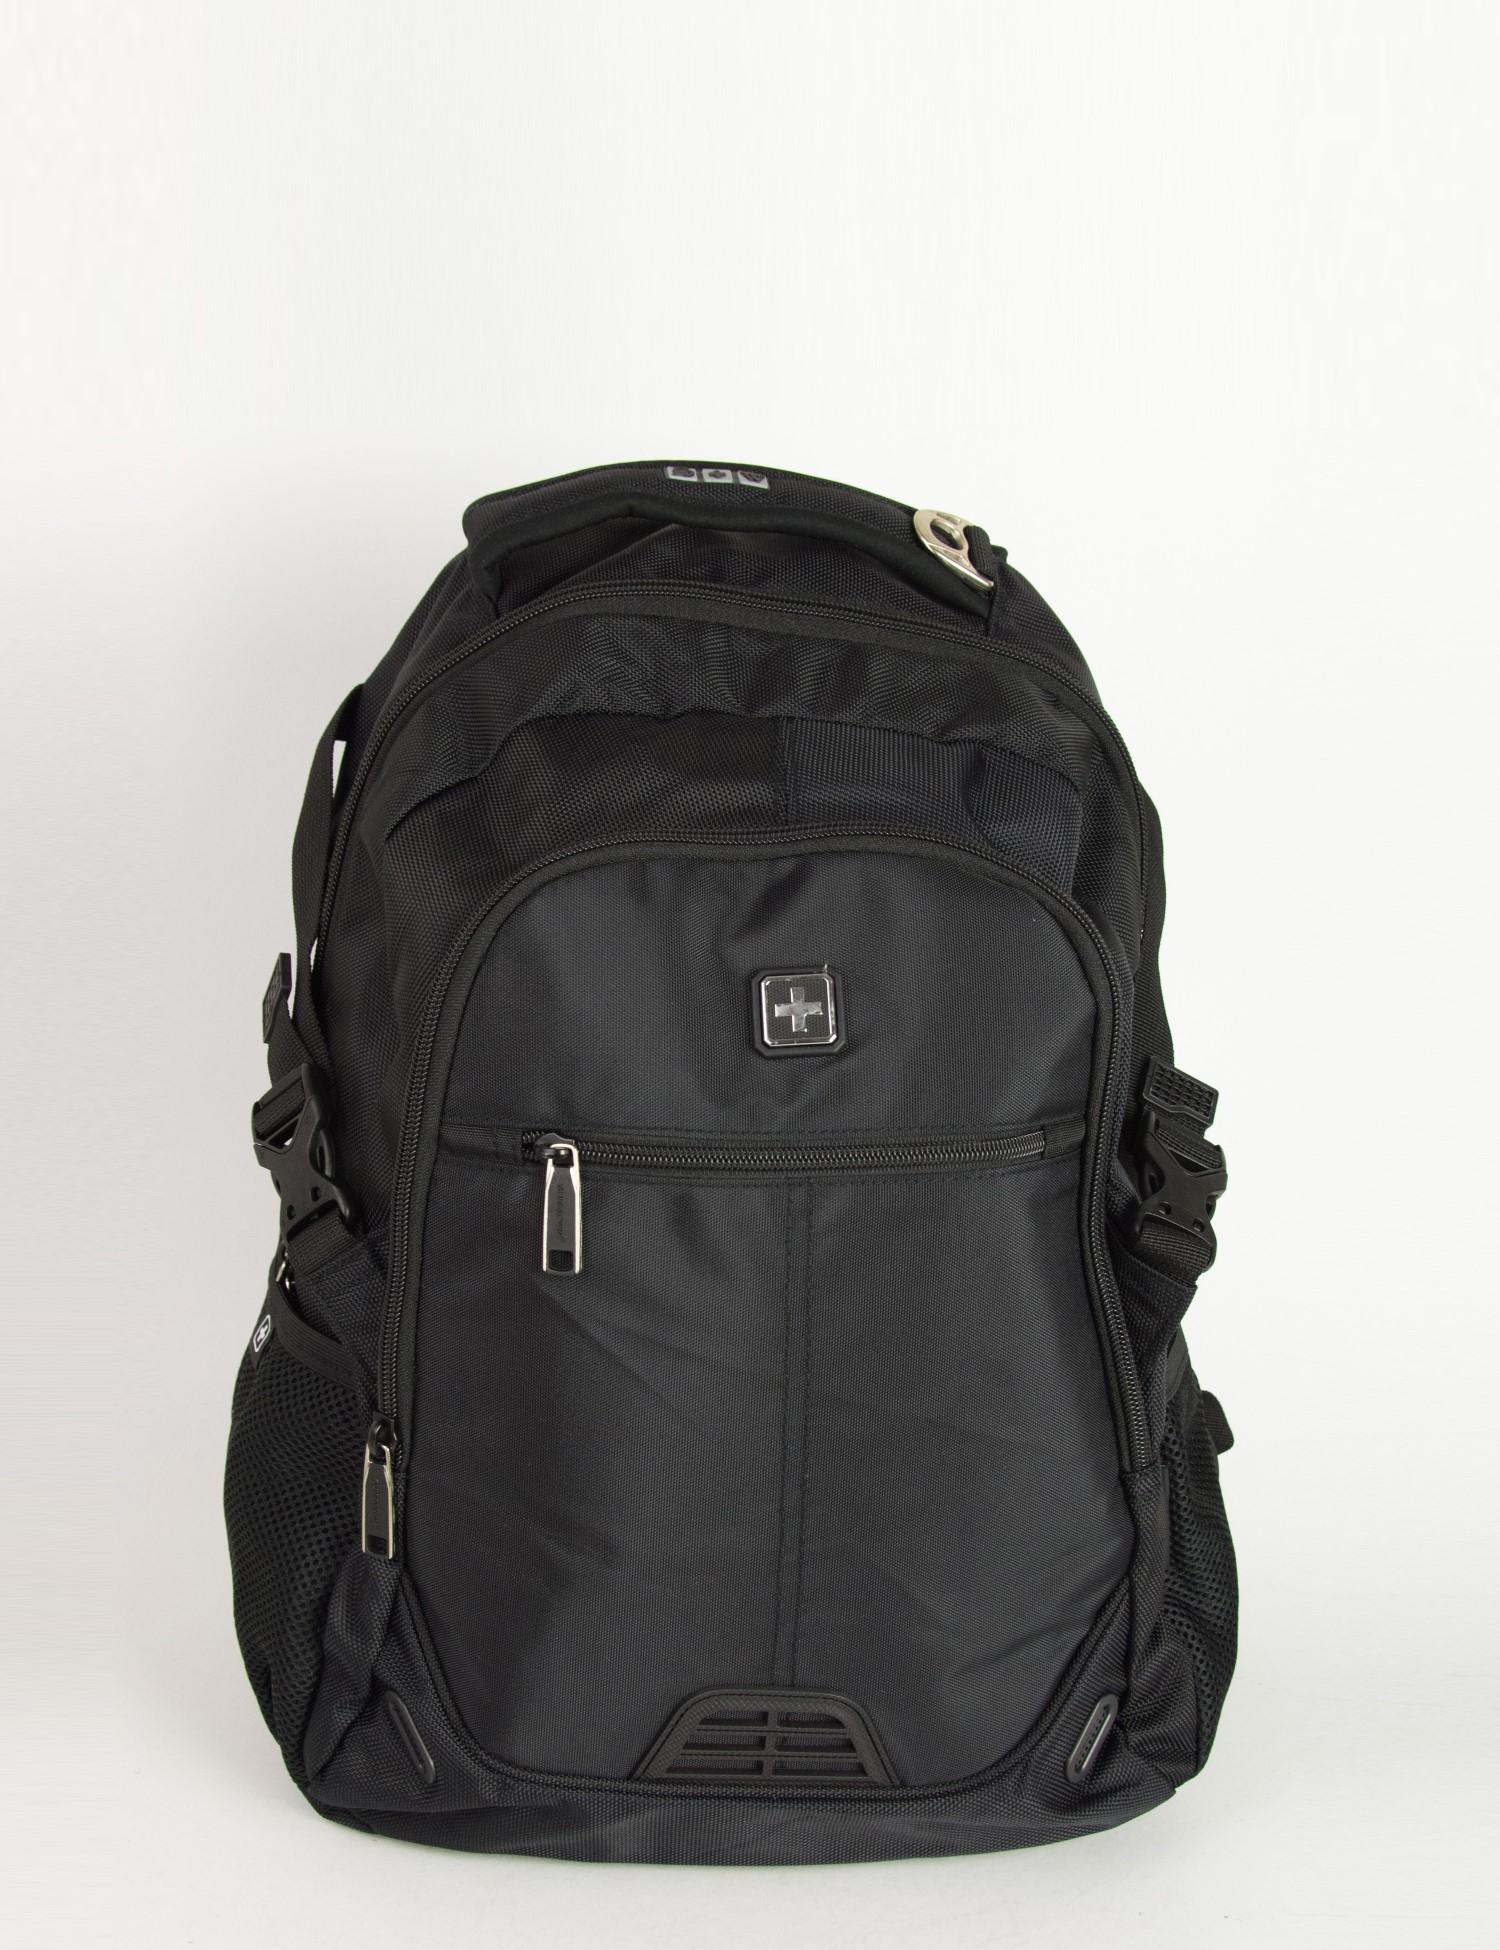 7785245e91 Torouxo Ανδρική μαύρη τσάντα μηχανής Suissewin Airflow System SN9510